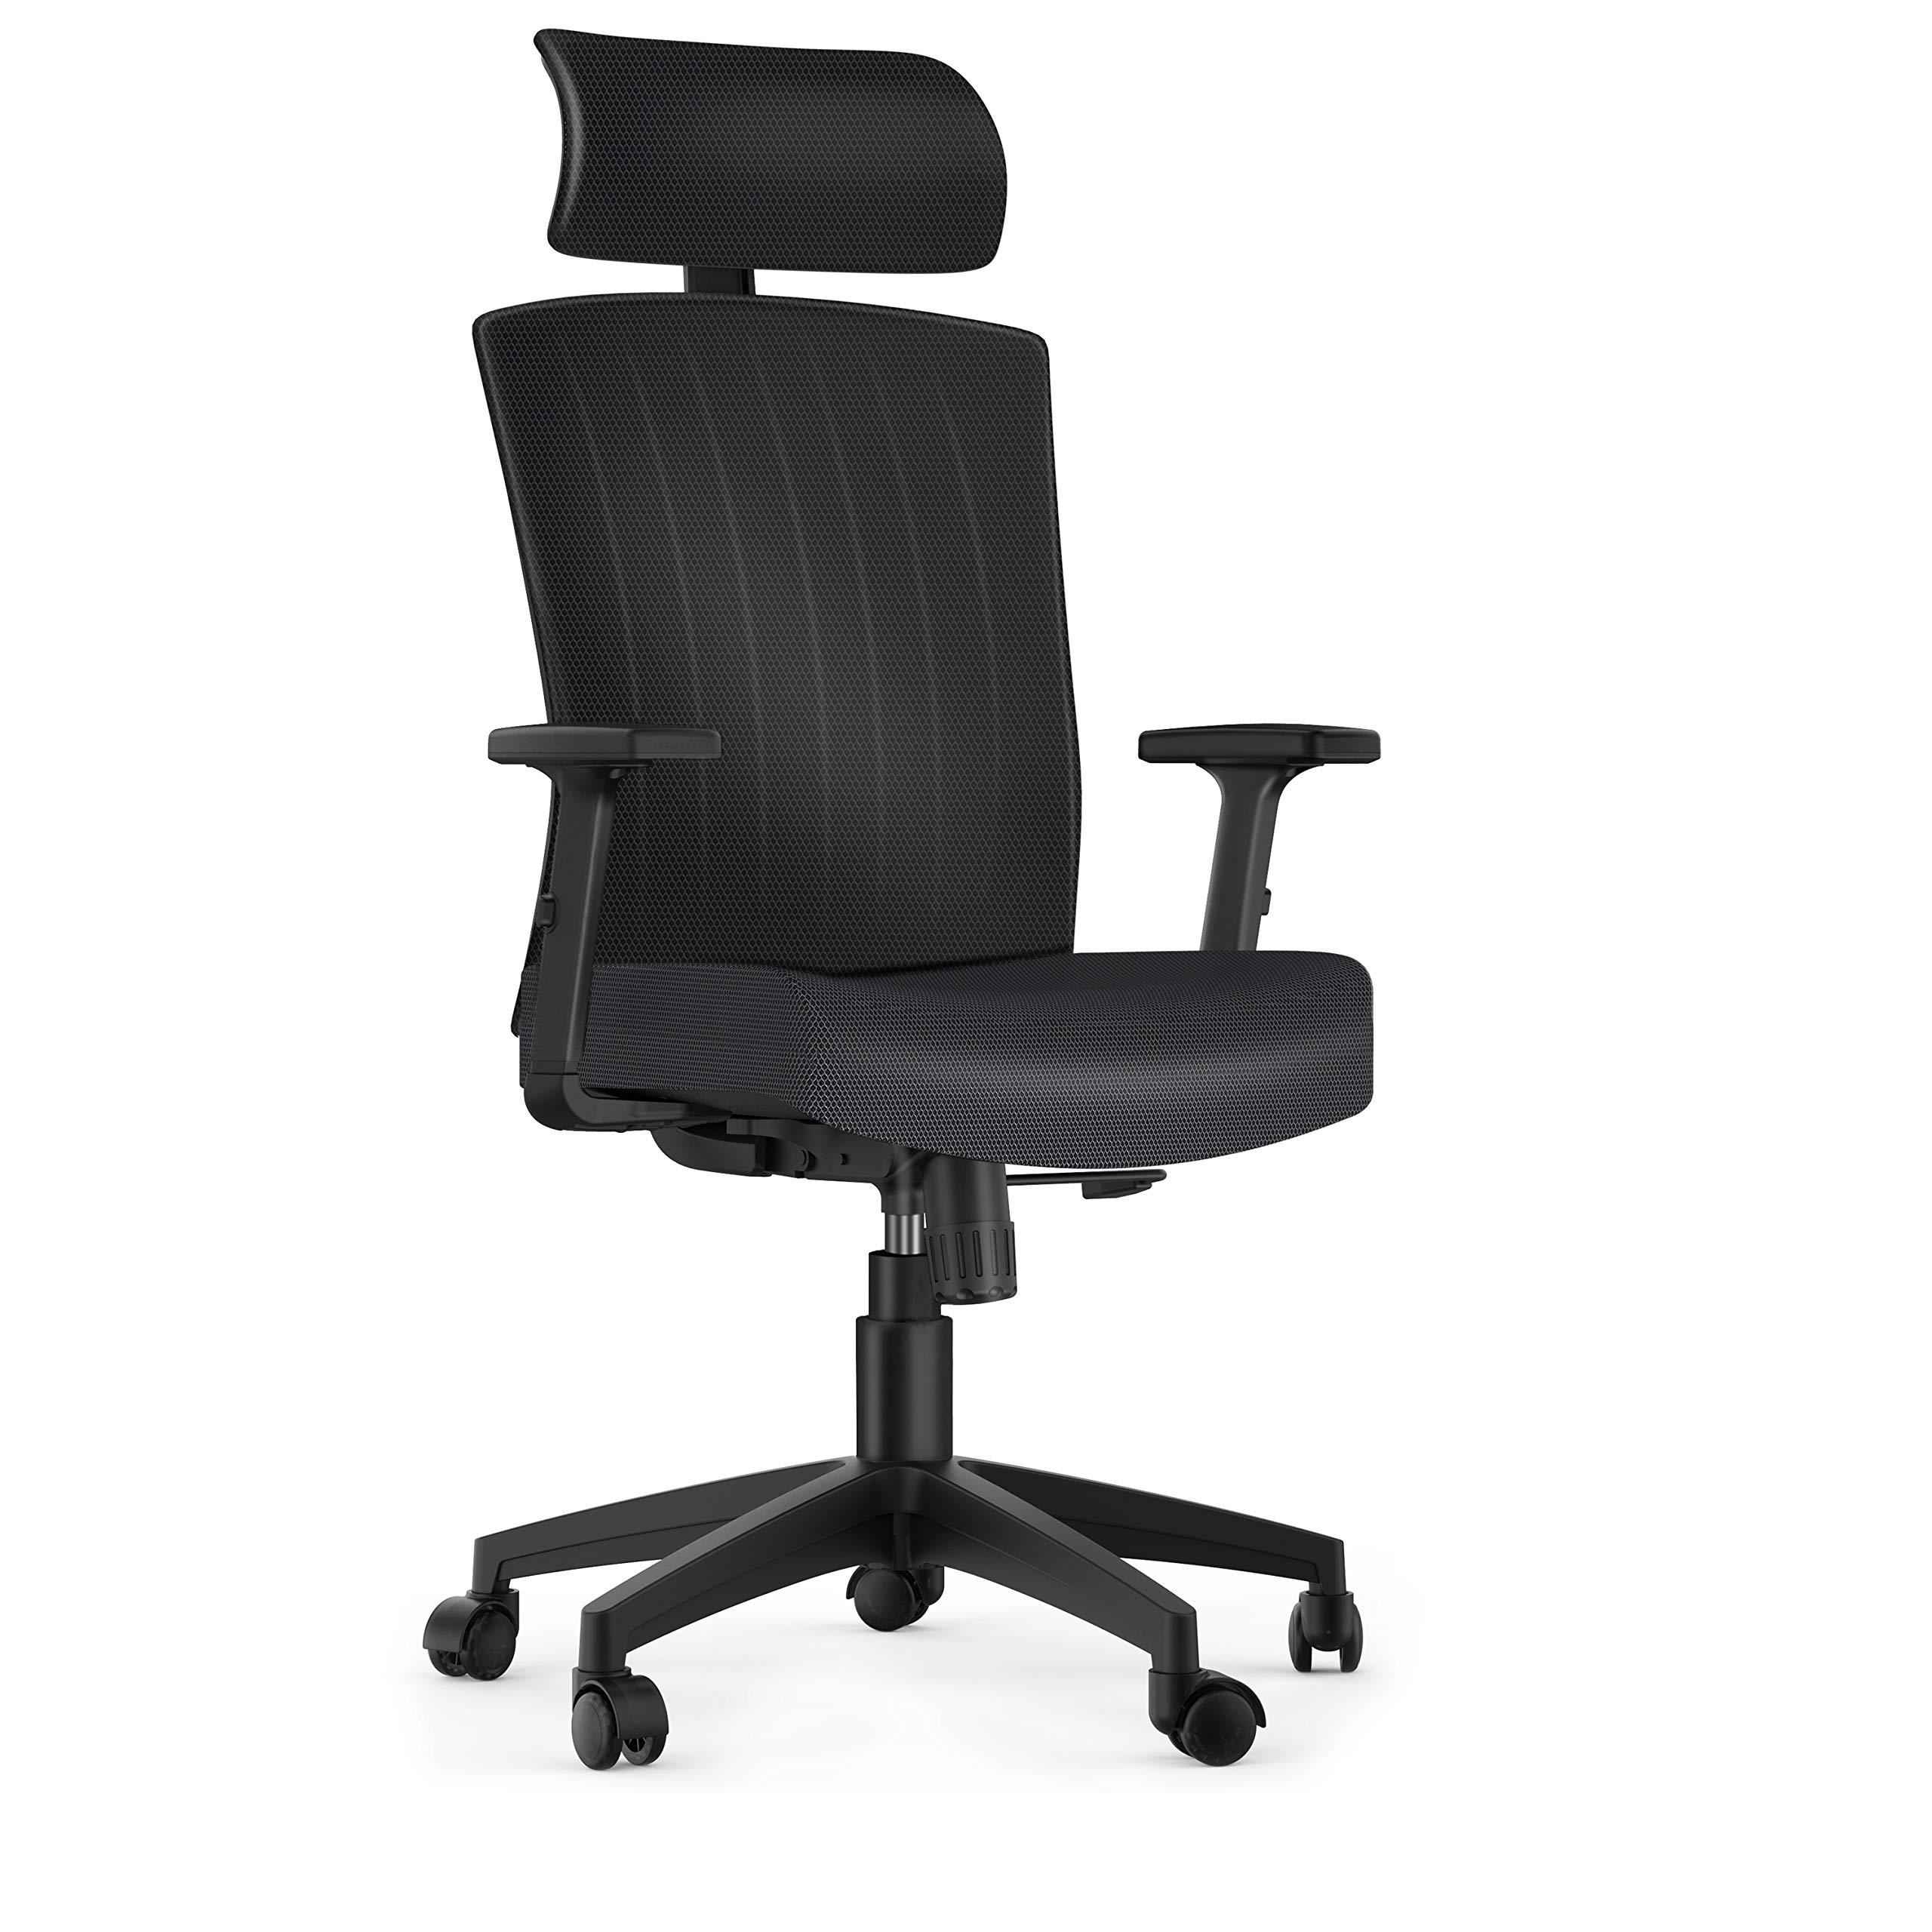 Ergonomic Office Chair High Back Mesh Desk Chair with Adjustable Seat Height Headrest Lumbar Support